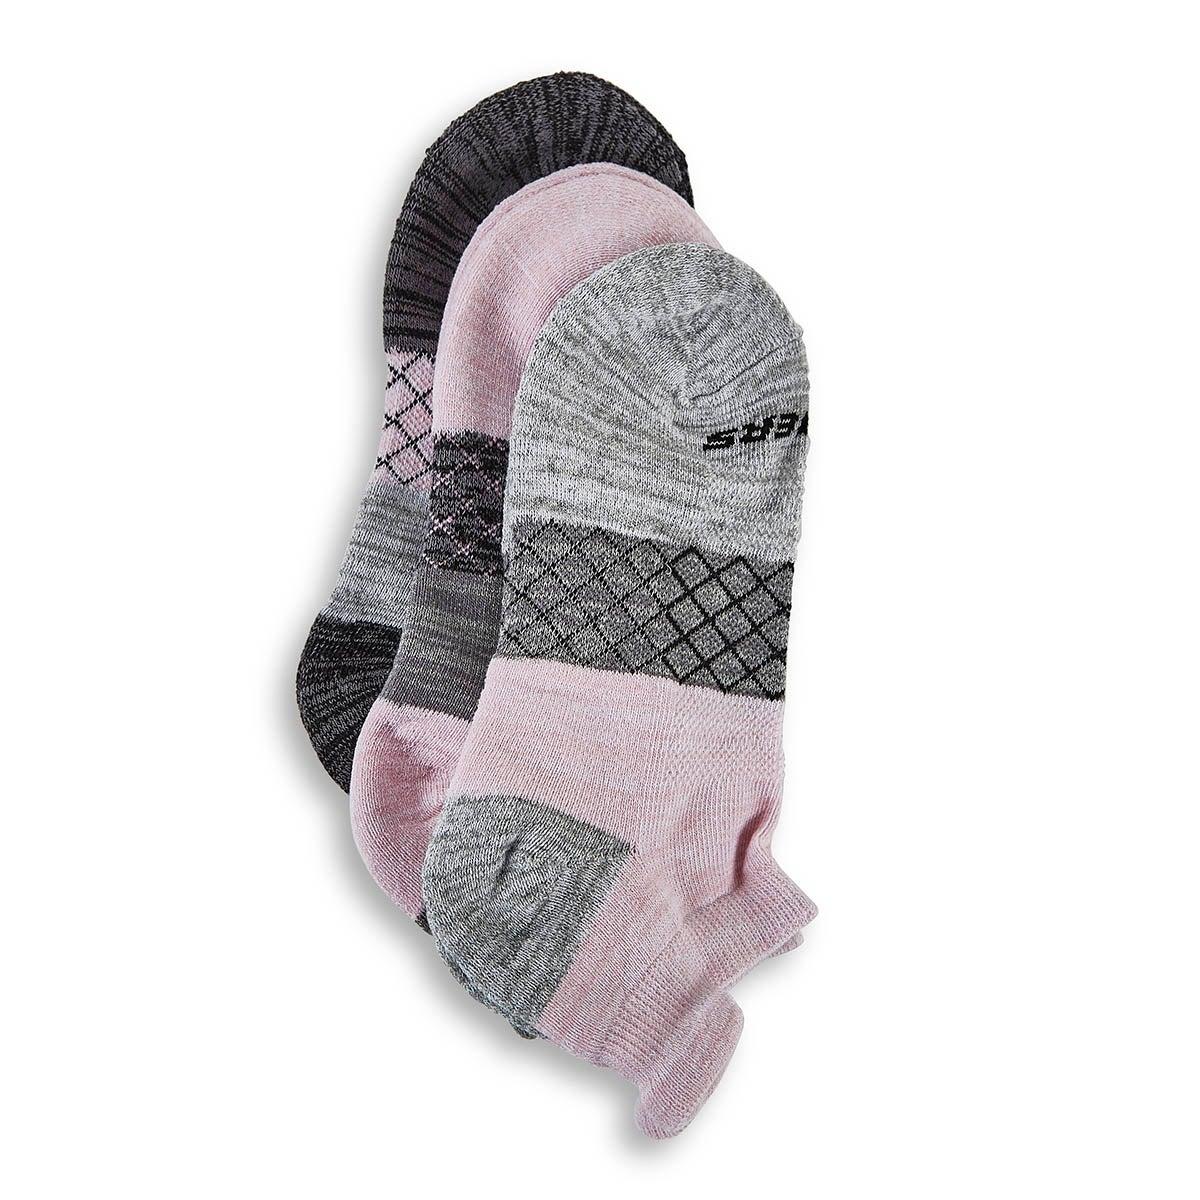 Women's HALF TERRY LOW CUT grey/pink socks -3pk